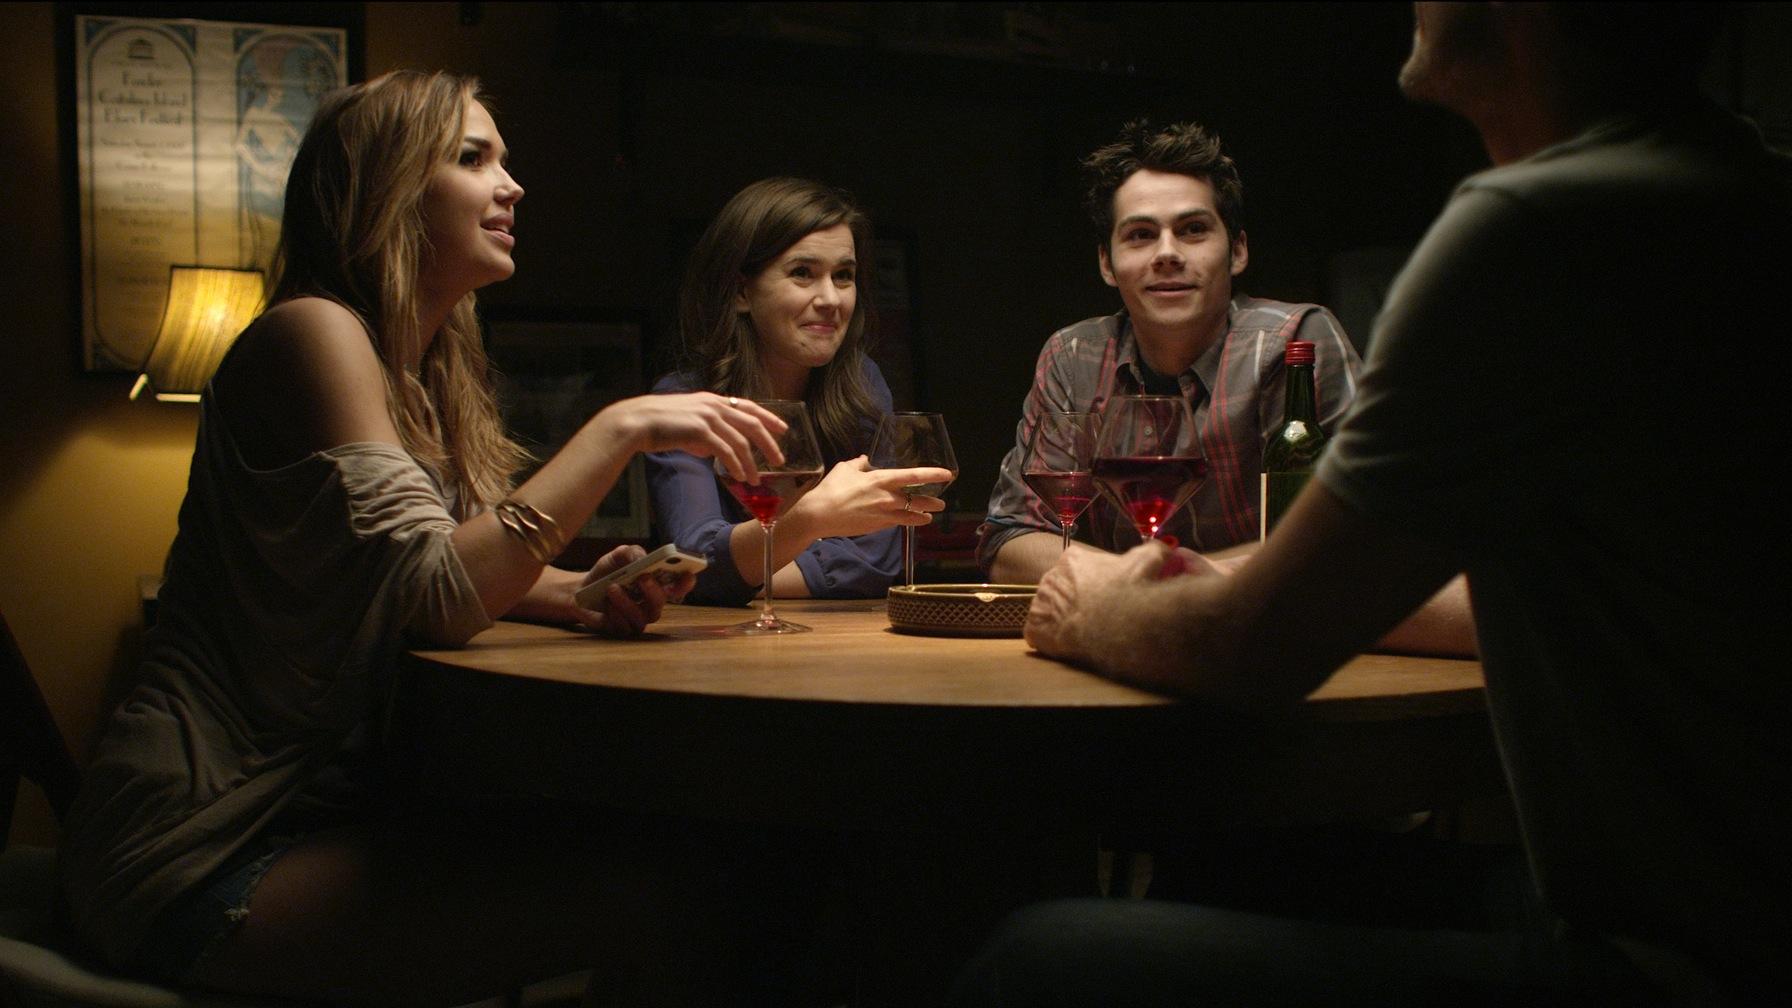 The Roommate Full Movie Online